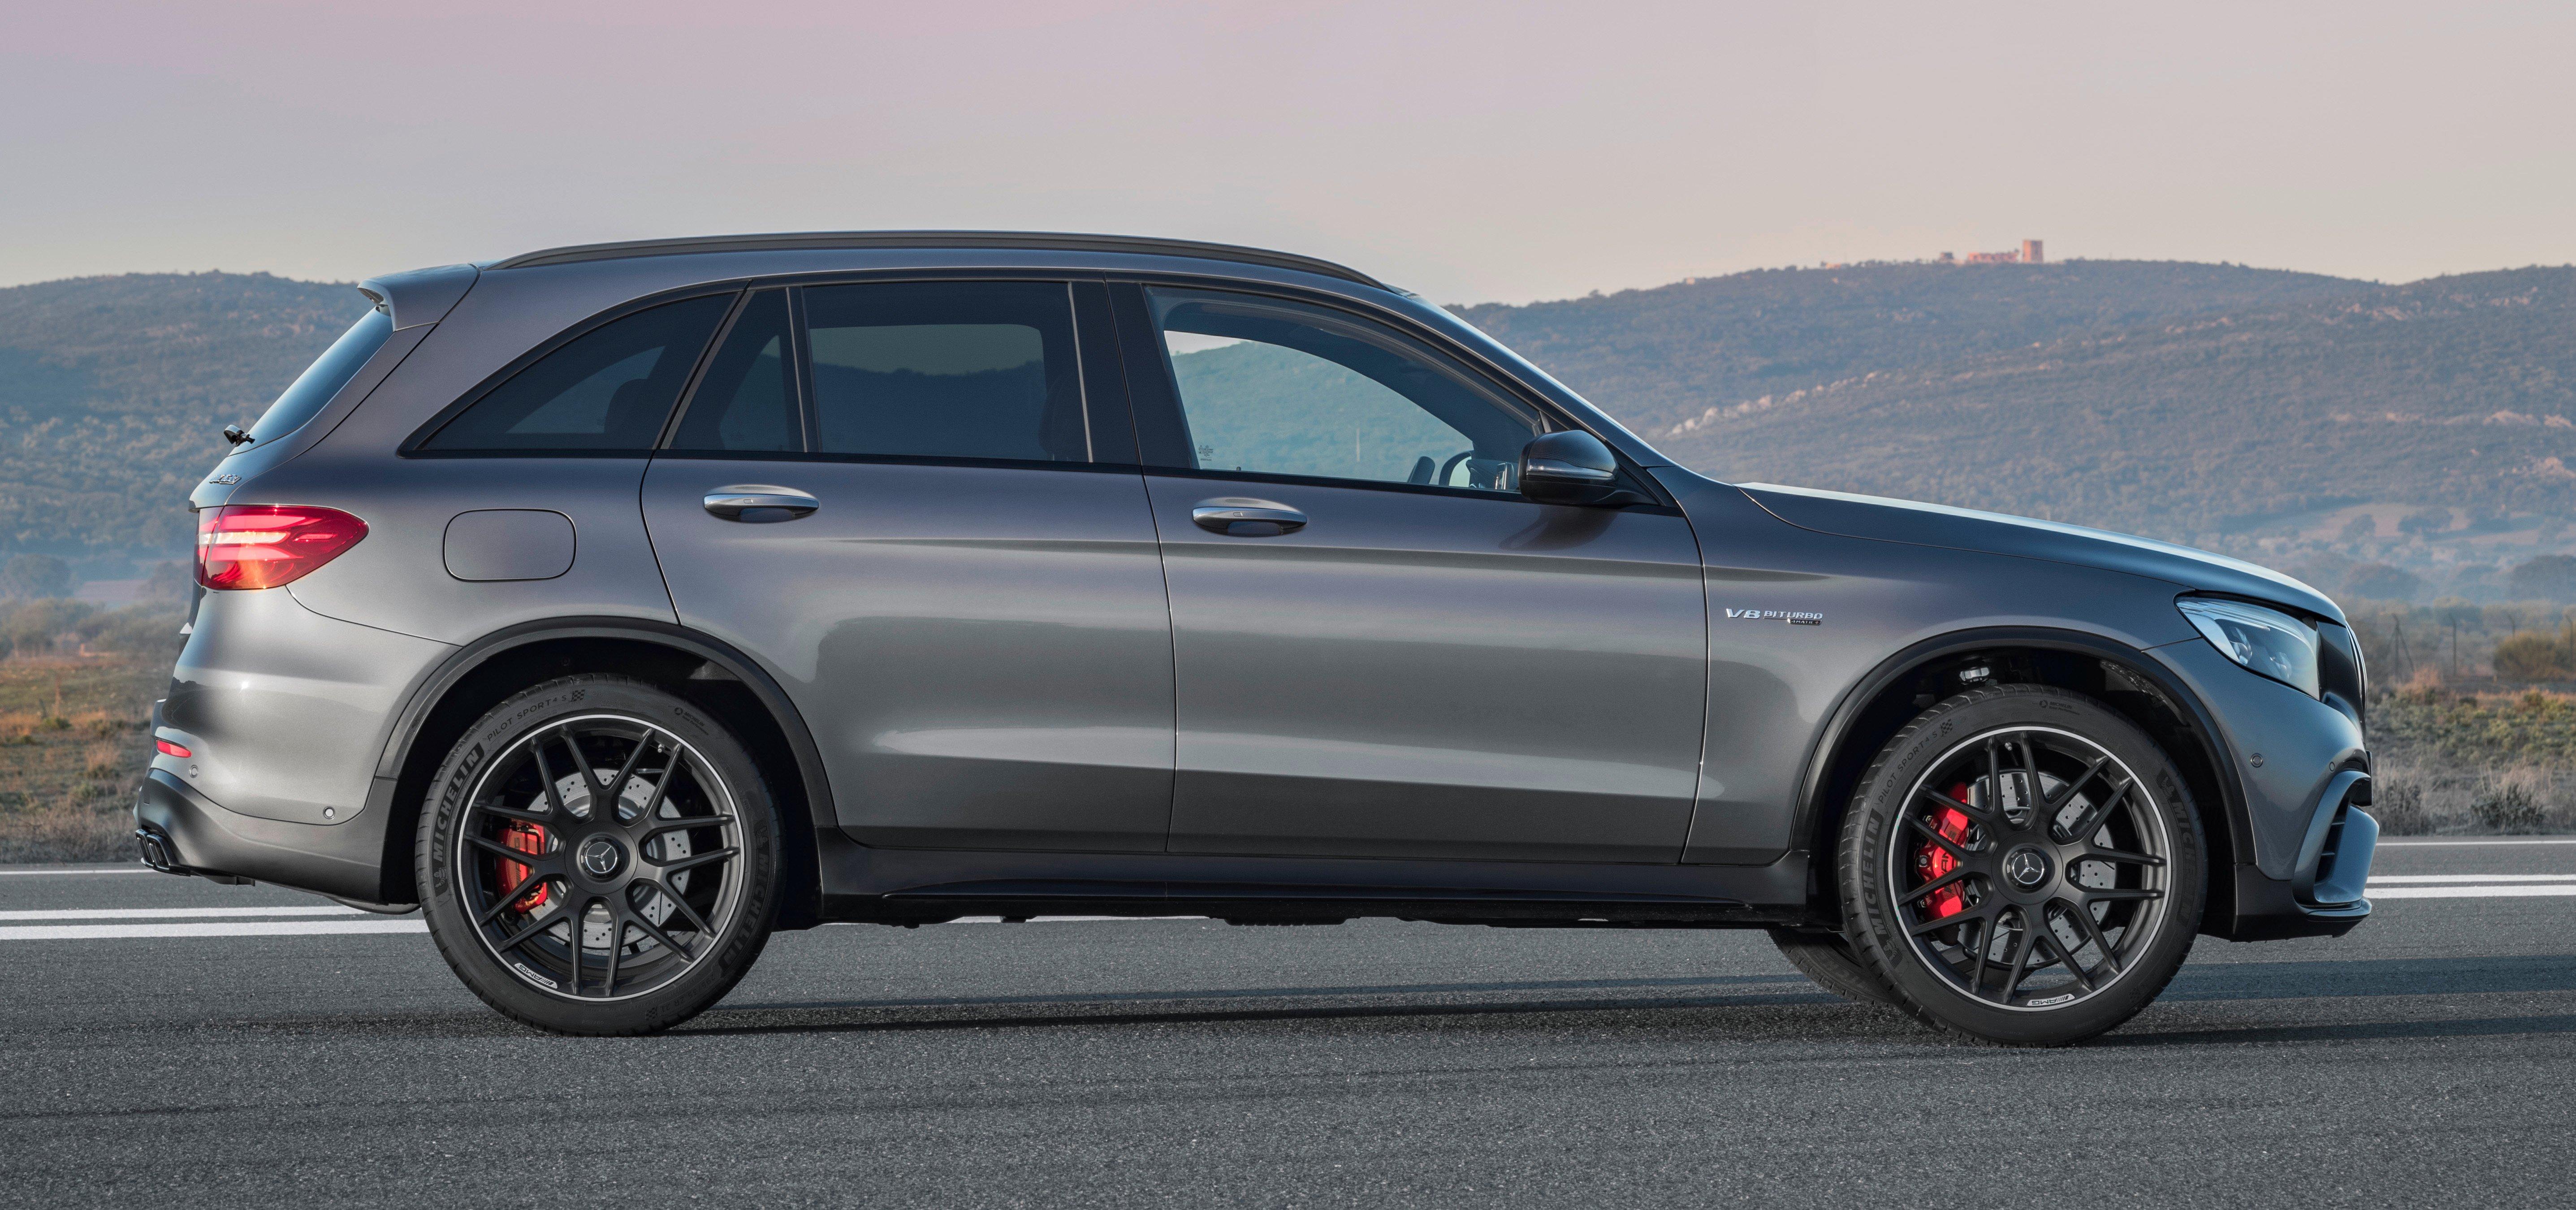 S 63 Amg 2017 >> 新Mercedes-AMG GLC 63系列三款车即将亮相纽约车展。 Mercedes-AMG GLC 63 S 4MATIC+, 2017 - Paul Tan 汽车资讯网